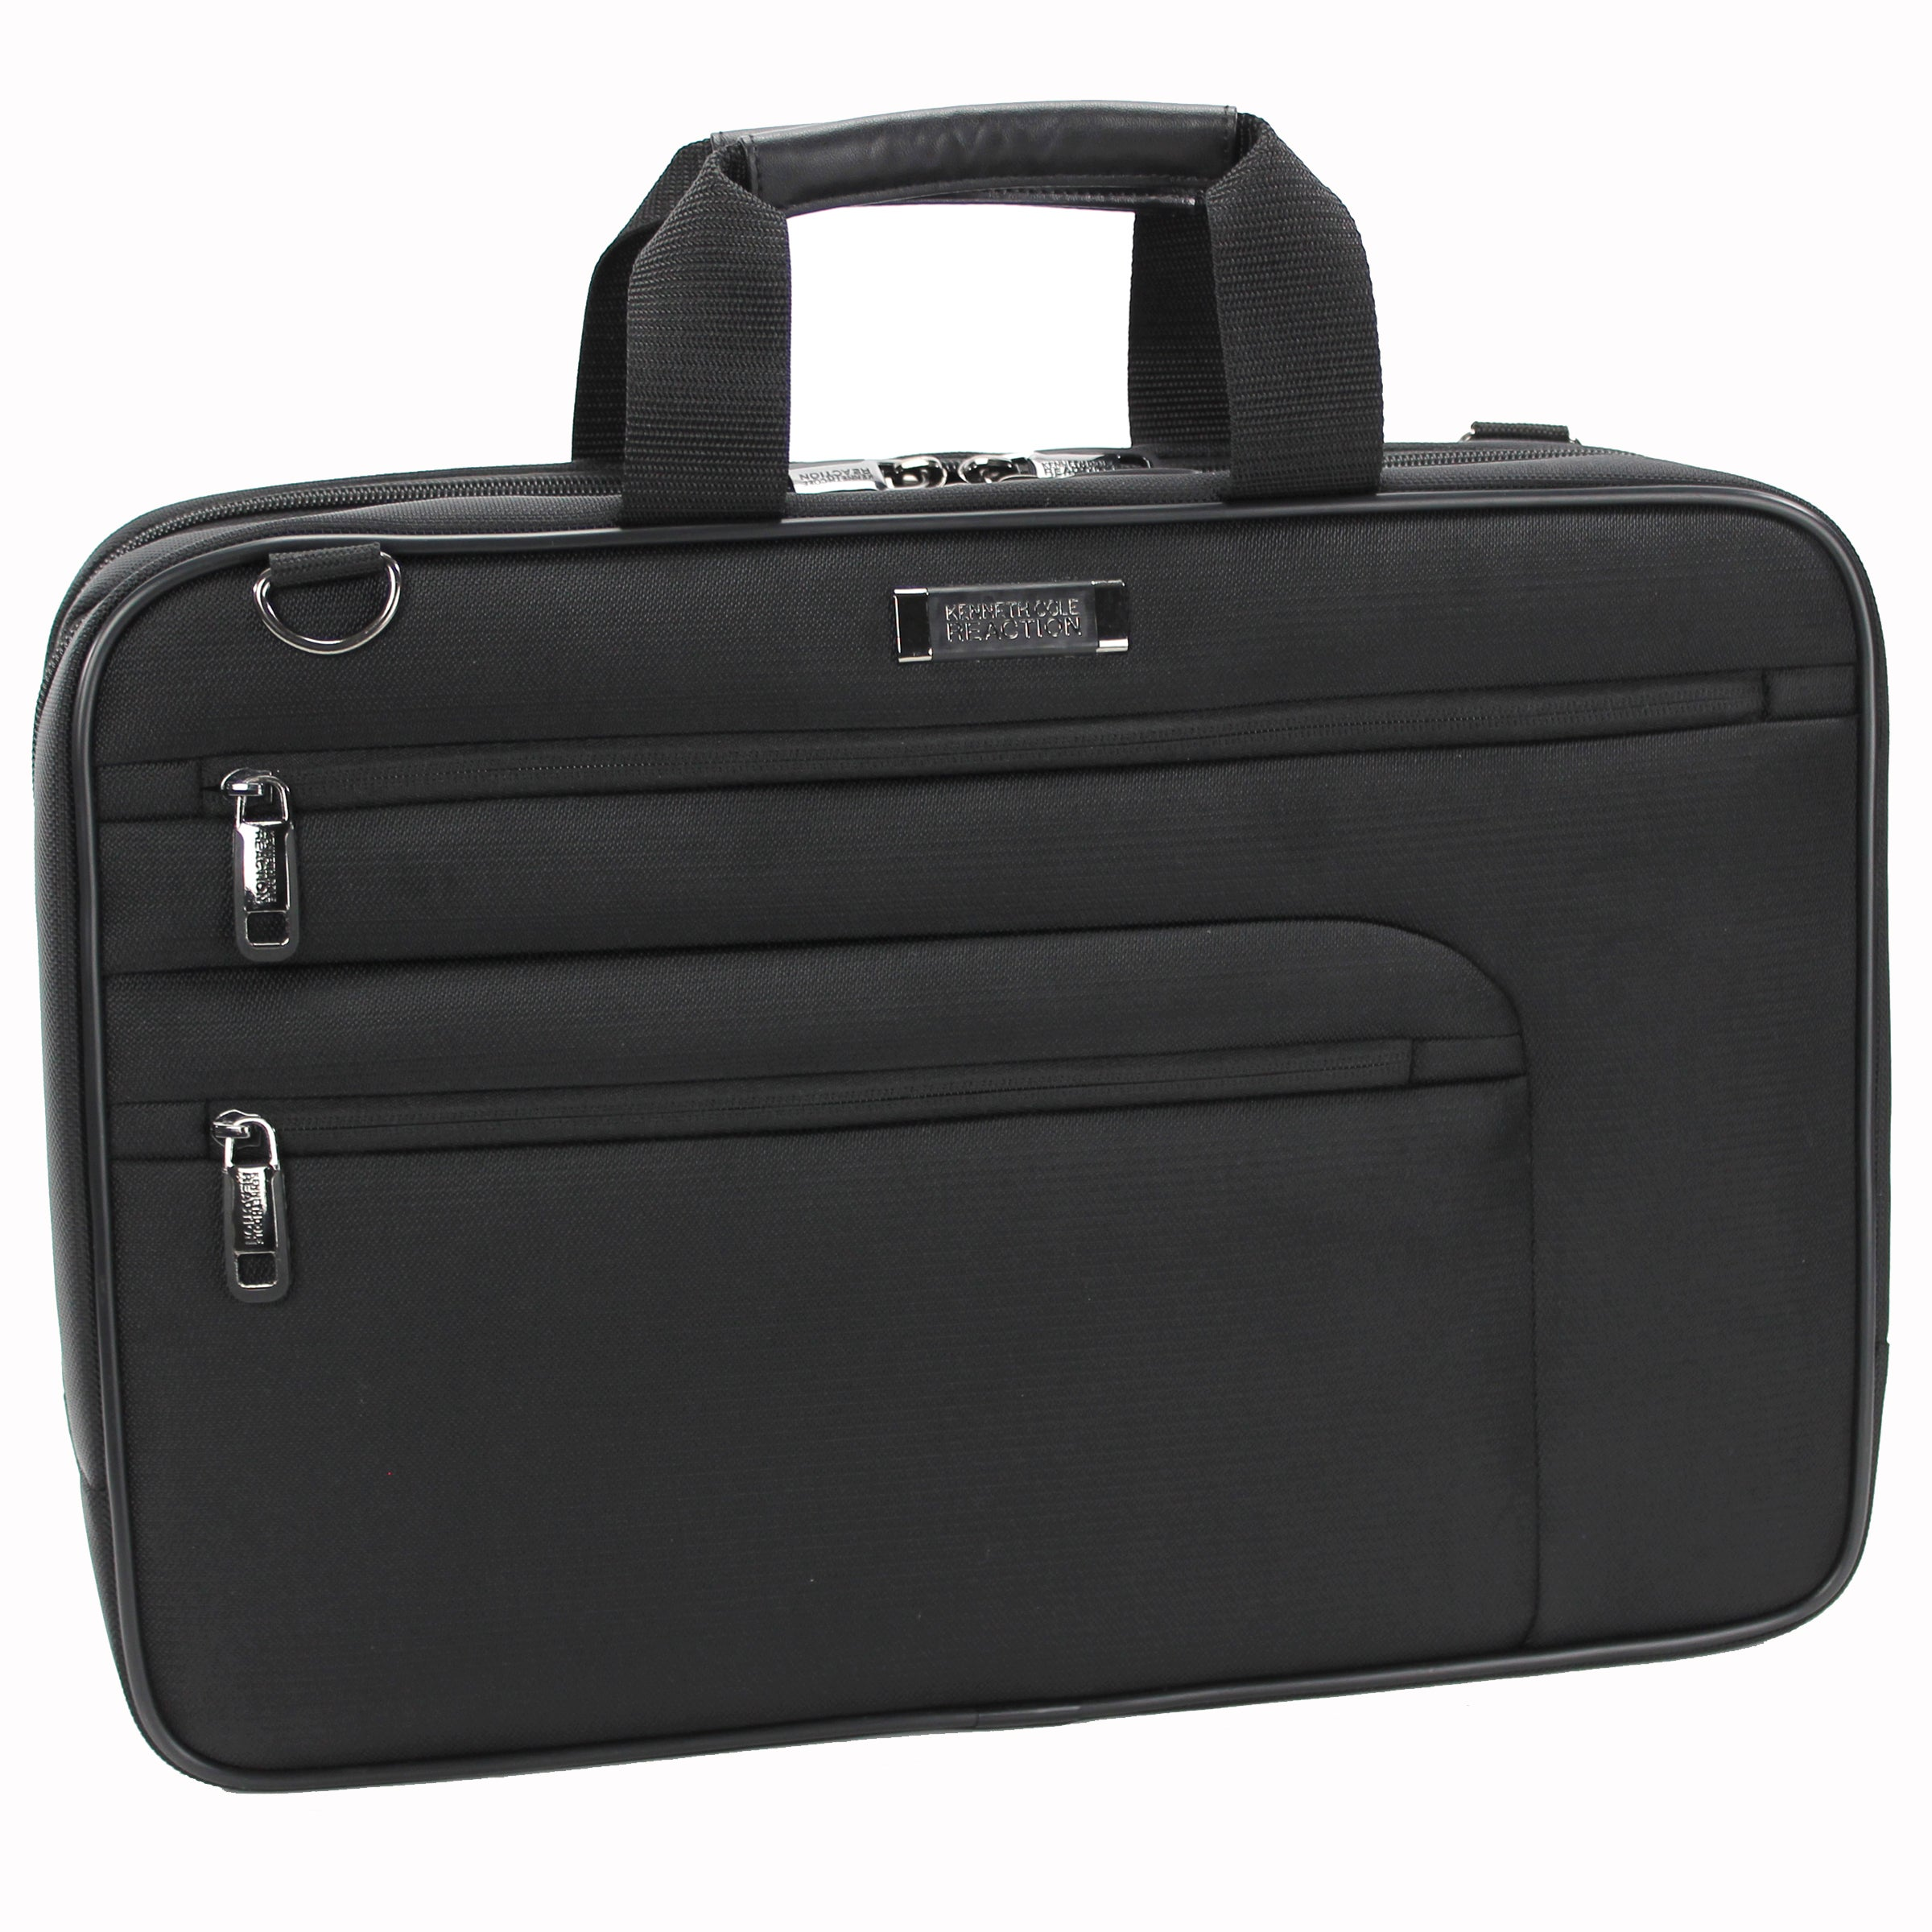 Kenneth Cole Top Zip 17-inch Laptop Briefcase